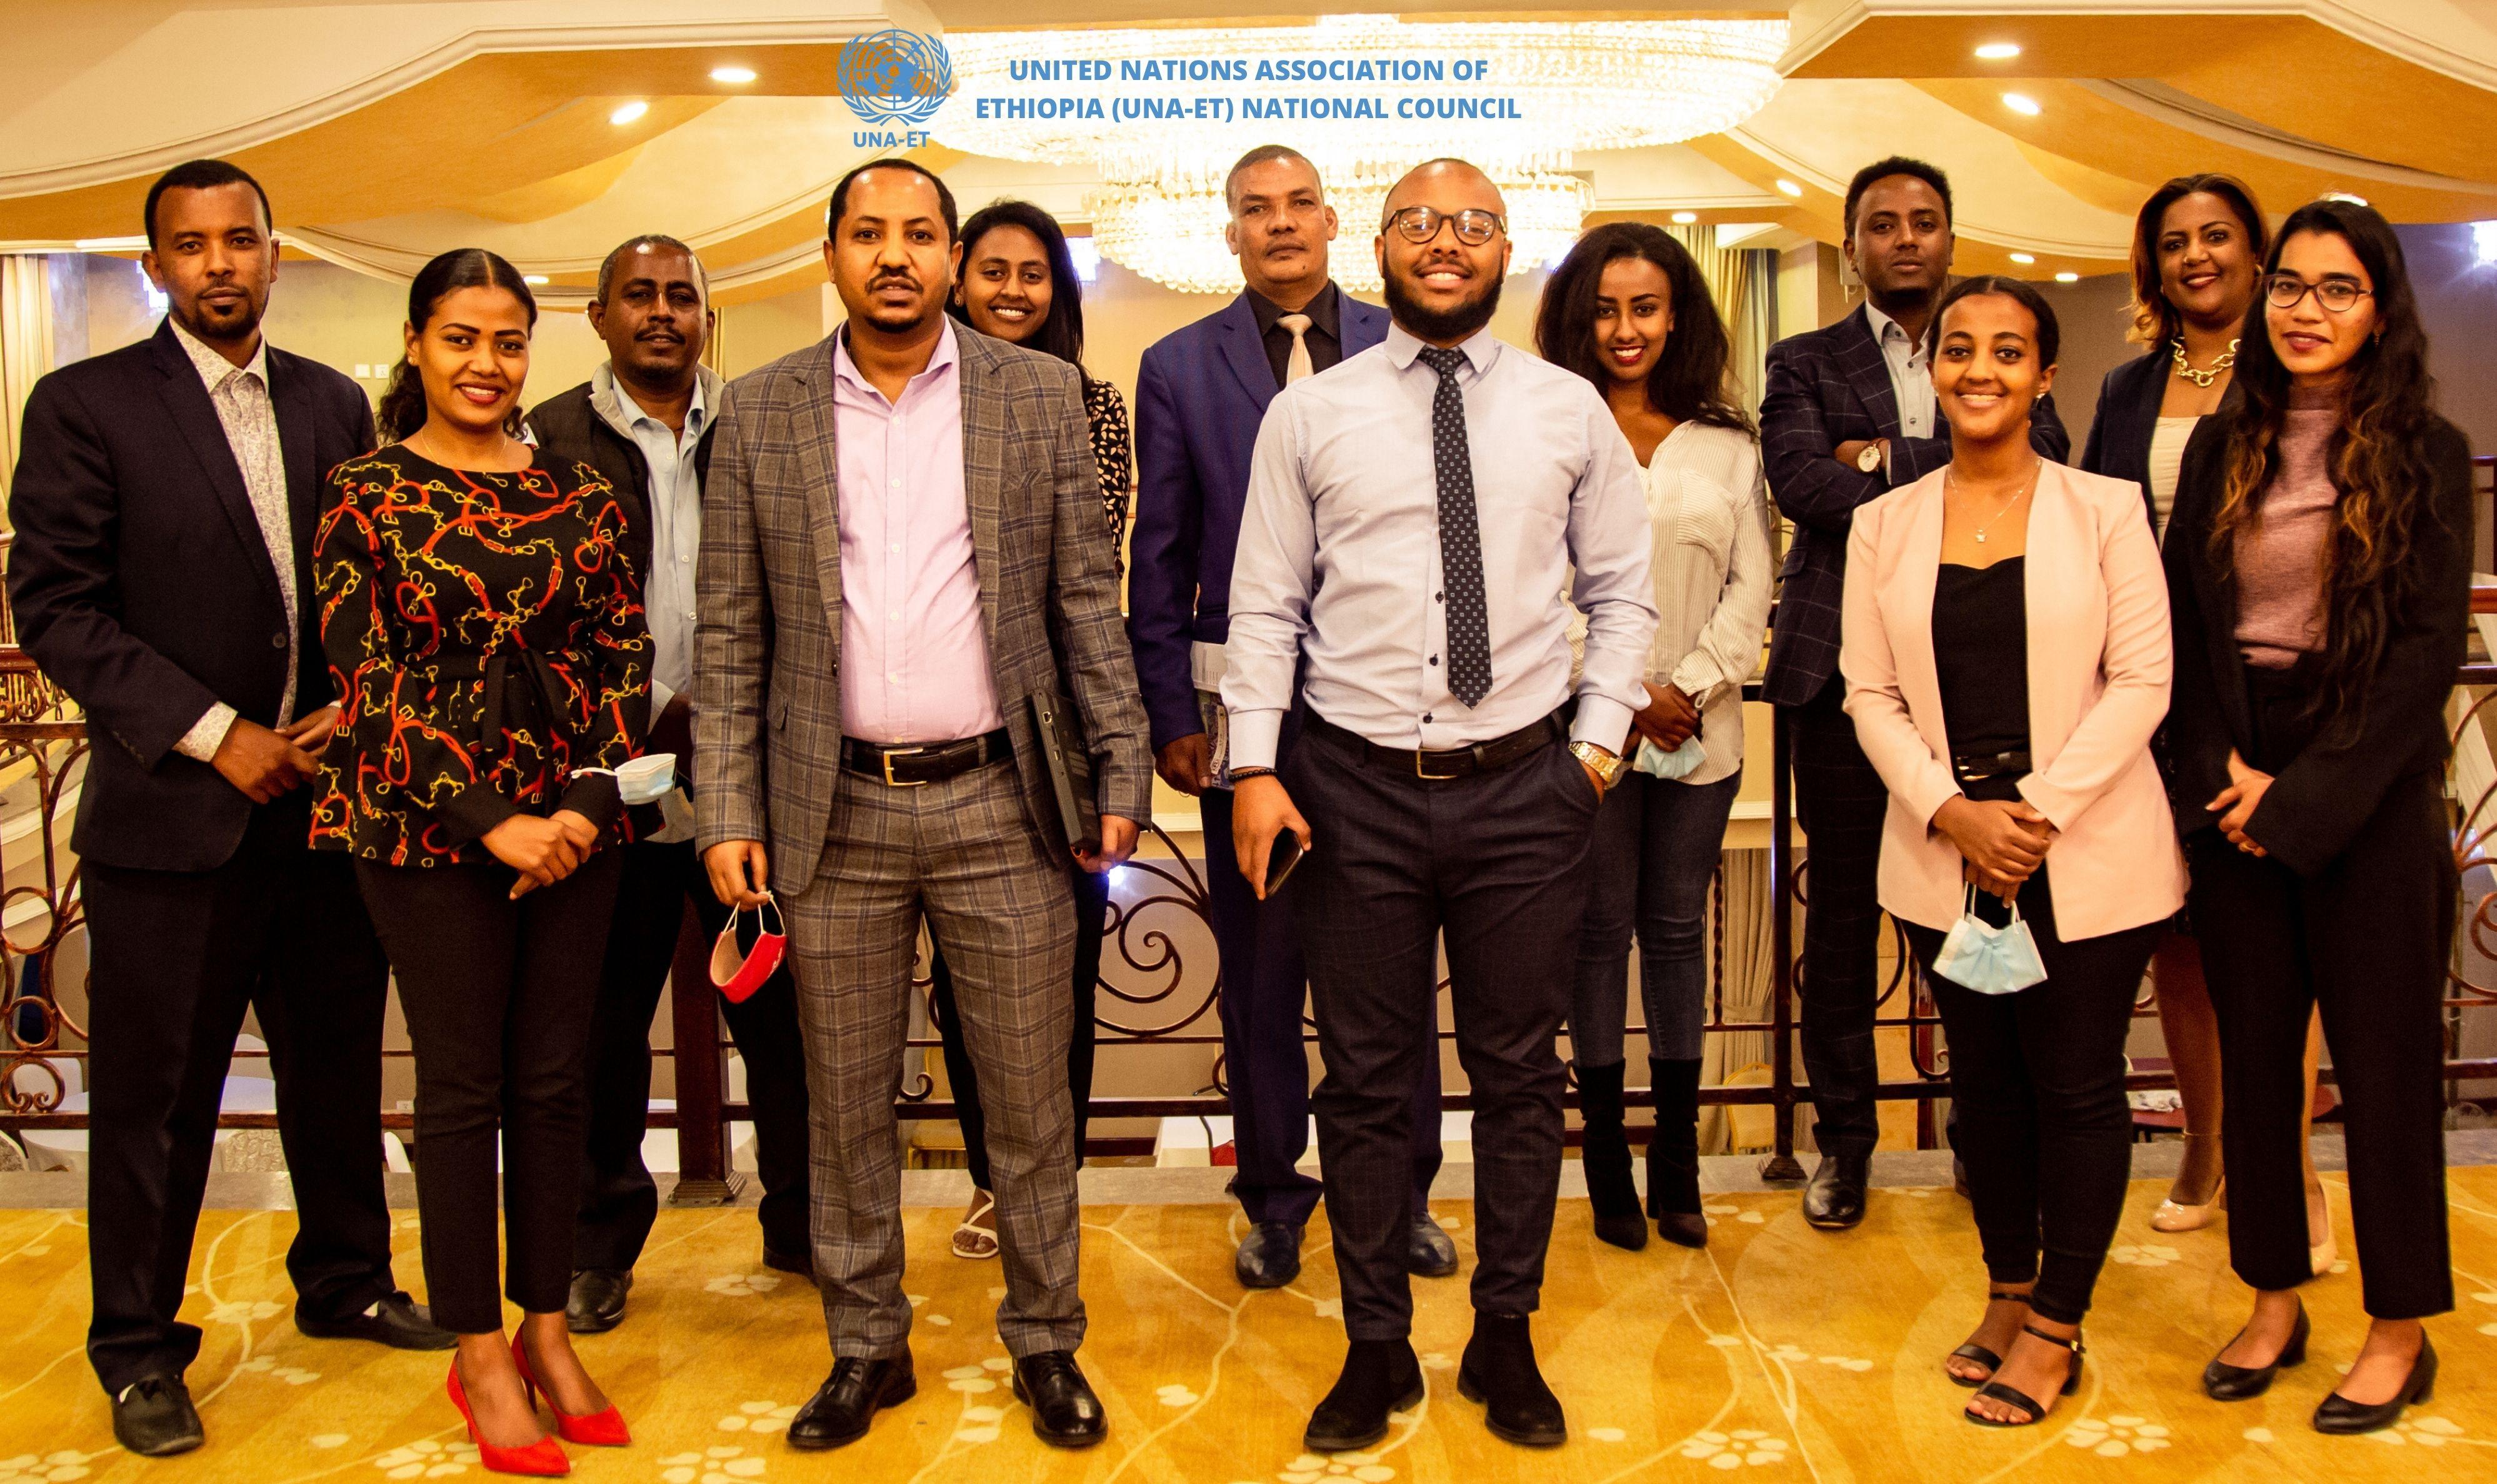 United Nations Association Ethiopia